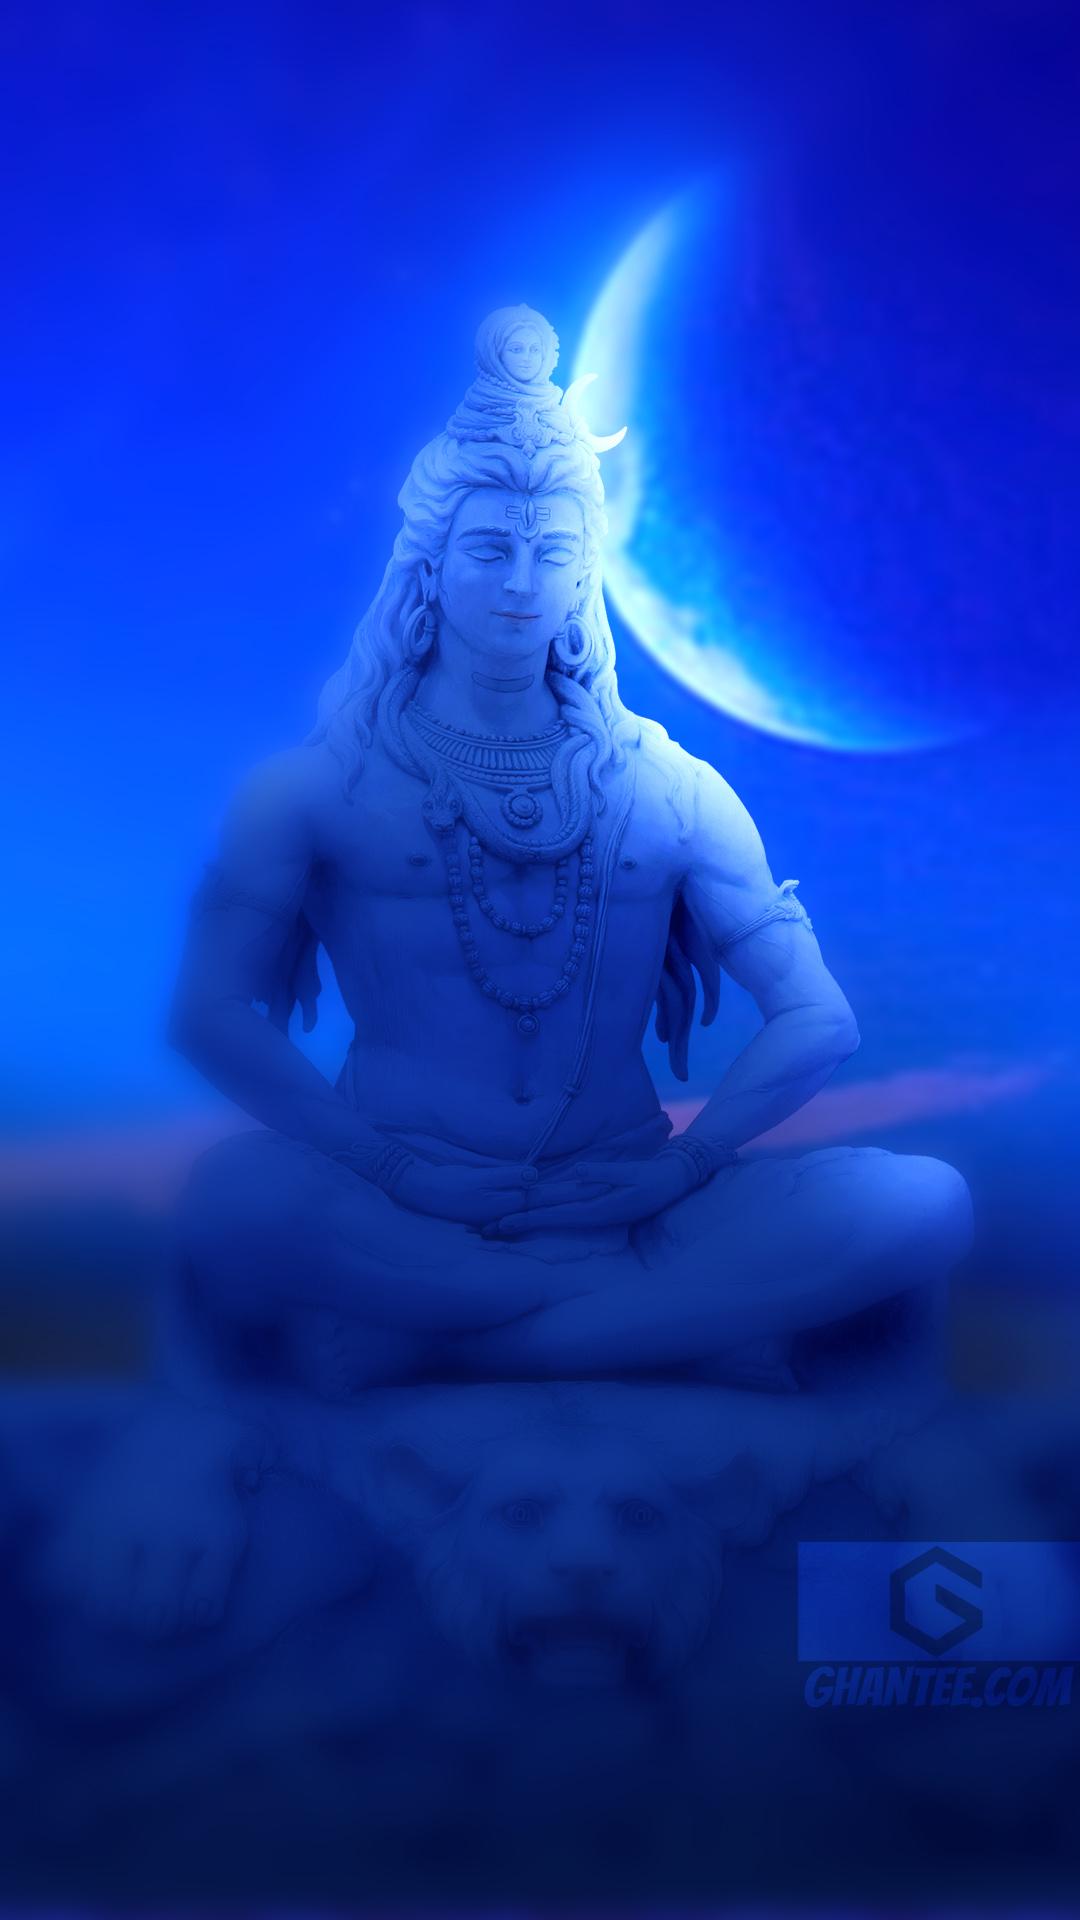 lord shiva in dream hd image